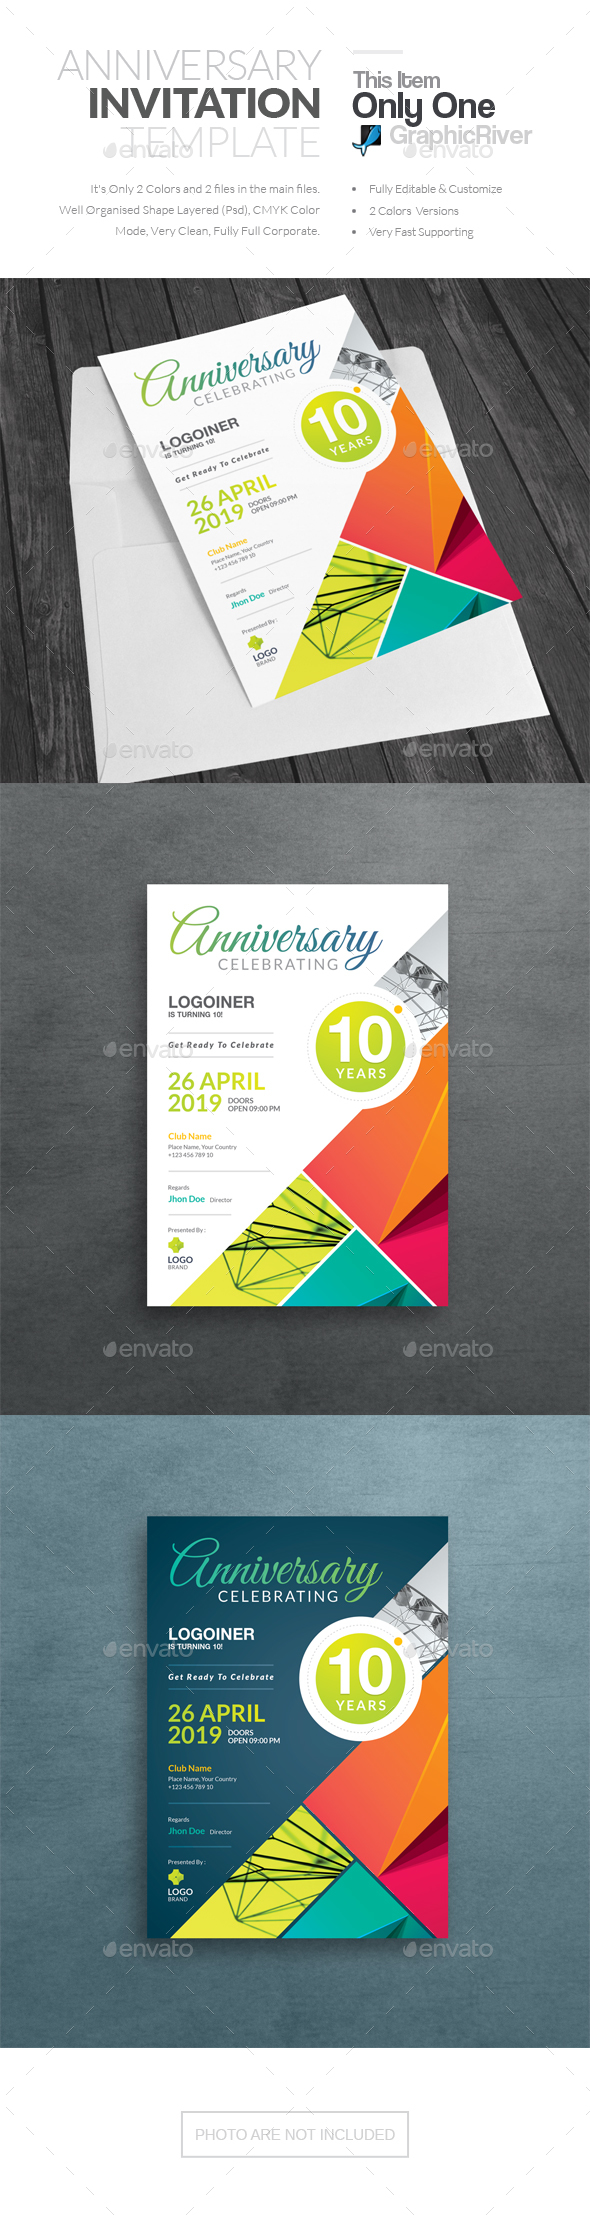 Anniversary Invitation - Cards & Invites Print Templates